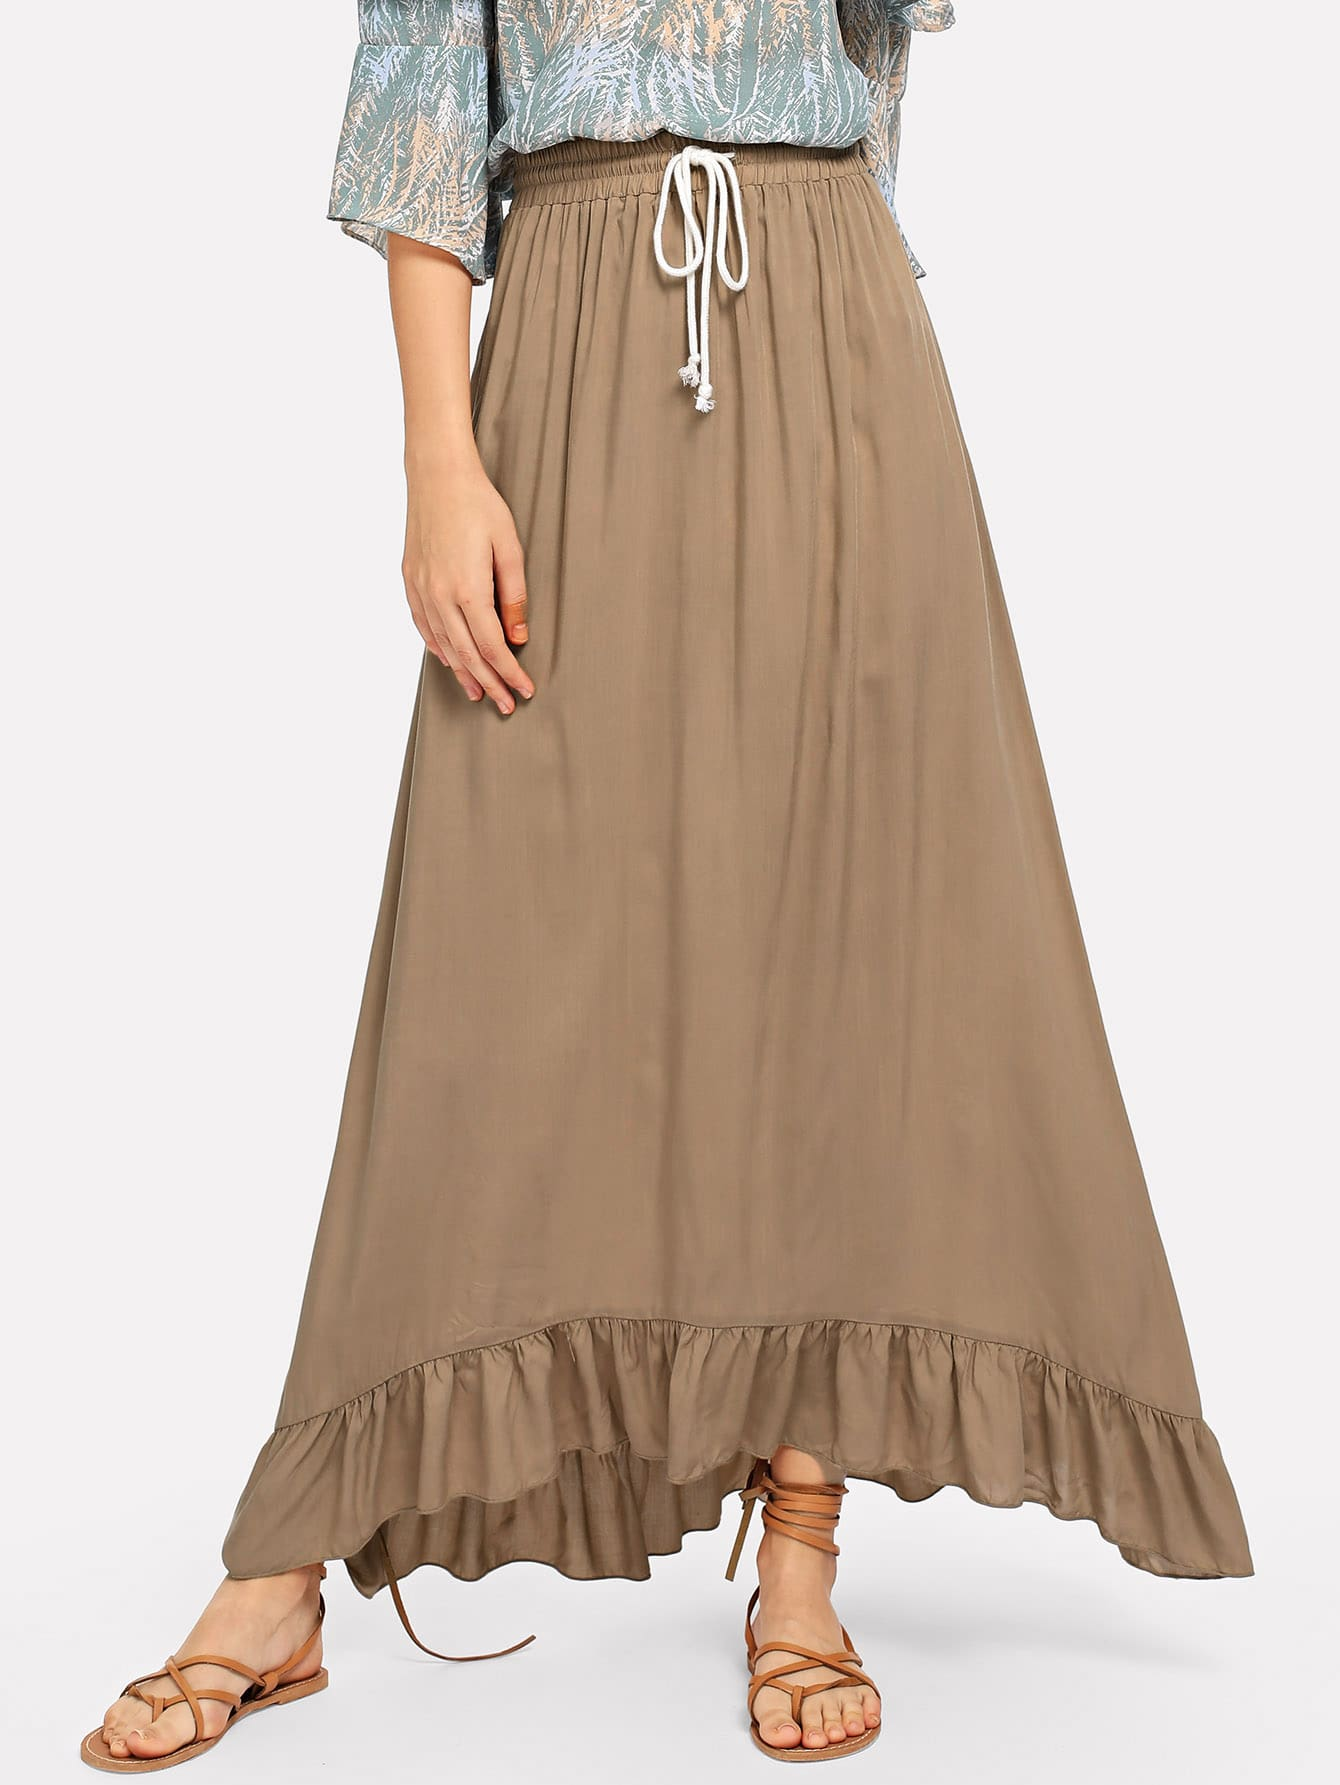 Купить Жестяная юбка, Teresa, SheIn